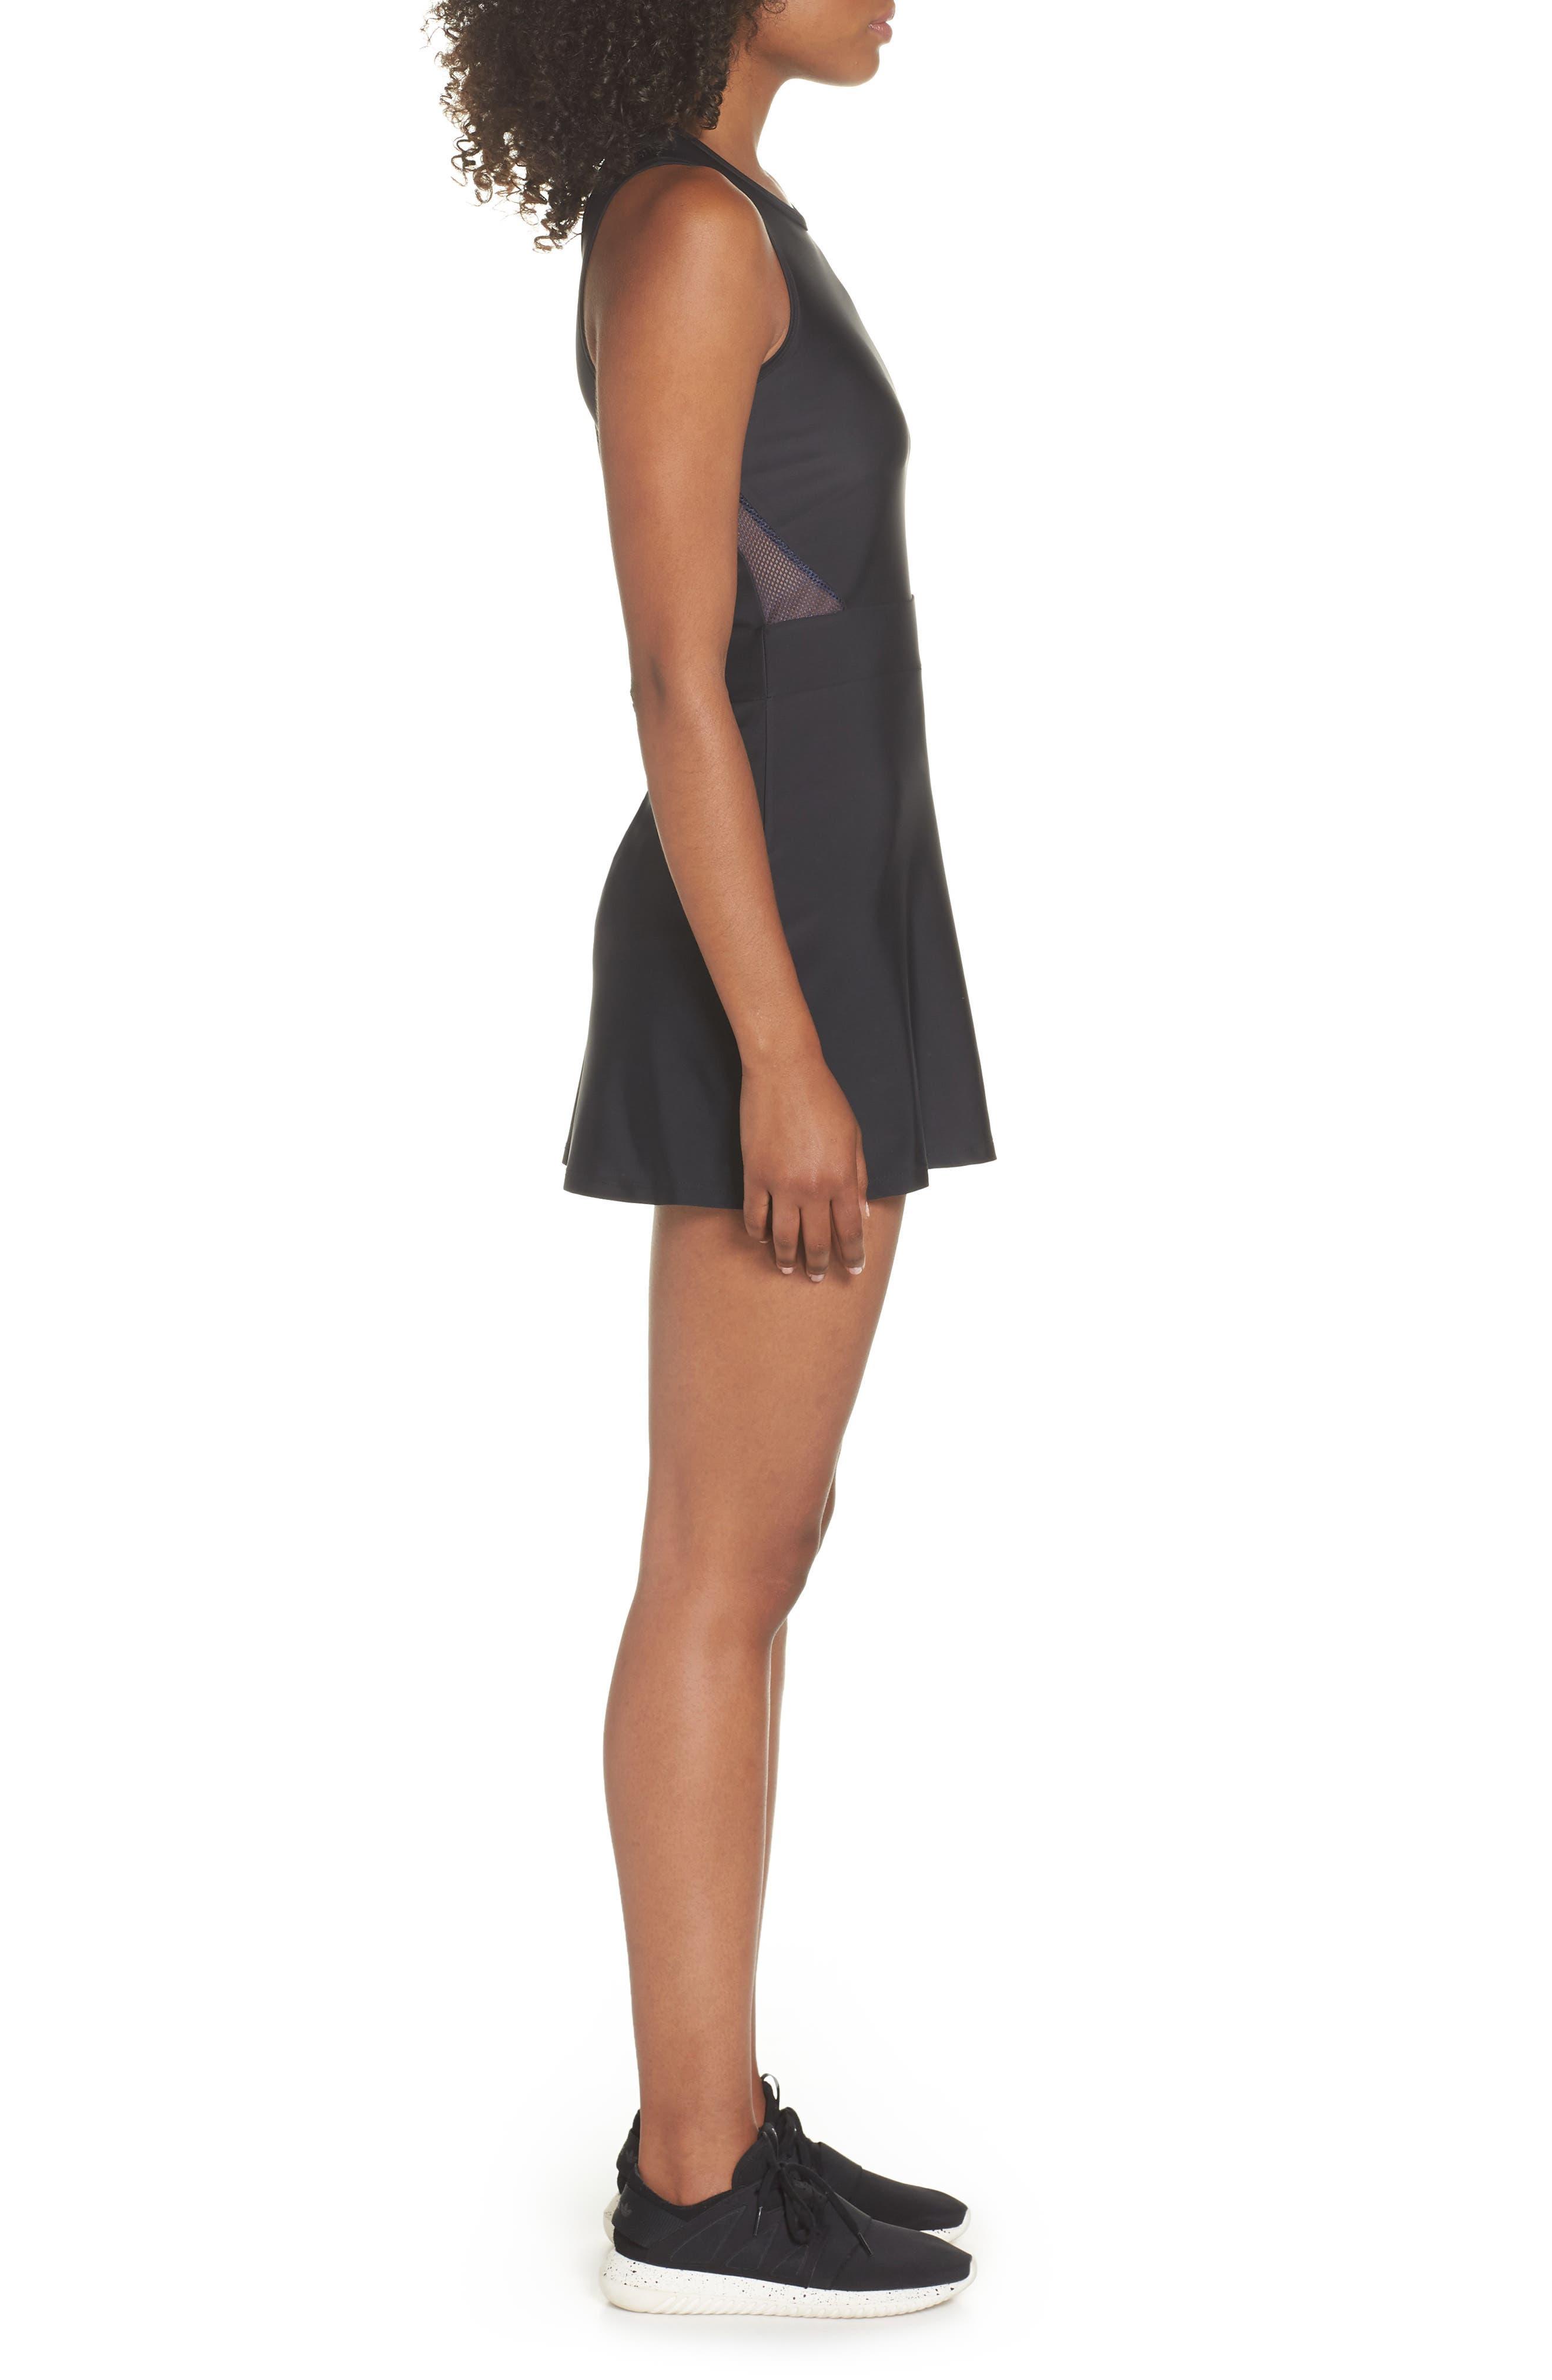 BoomBoom Athletica Tennis Dress,                             Alternate thumbnail 3, color,                             Black/ Navy